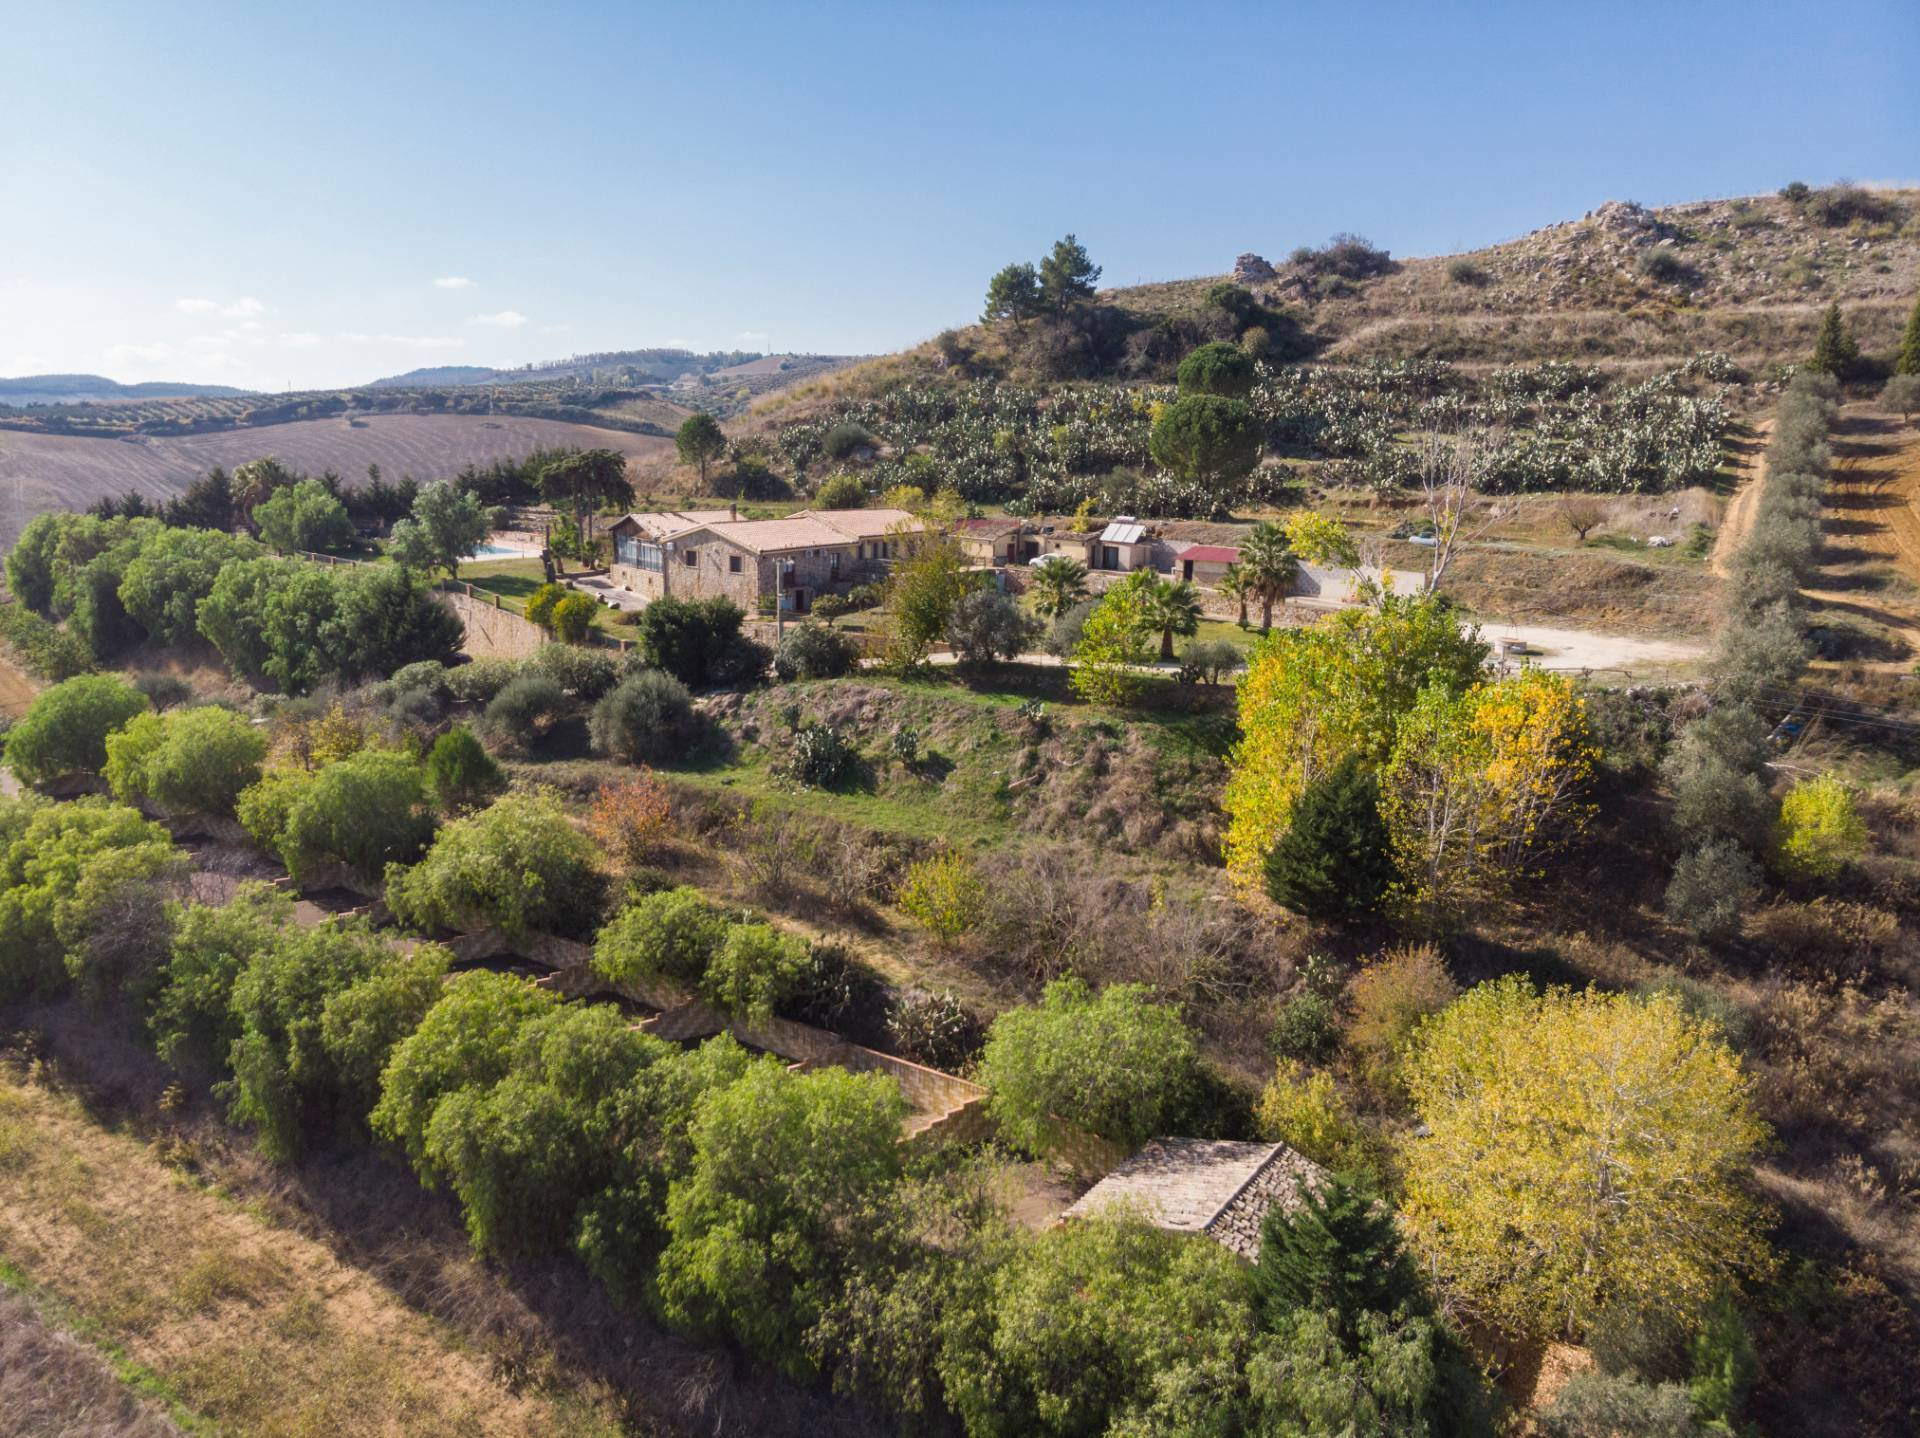 Villa in Vendita a Piazza Armerina: 5 locali, 550 mq - Foto 1